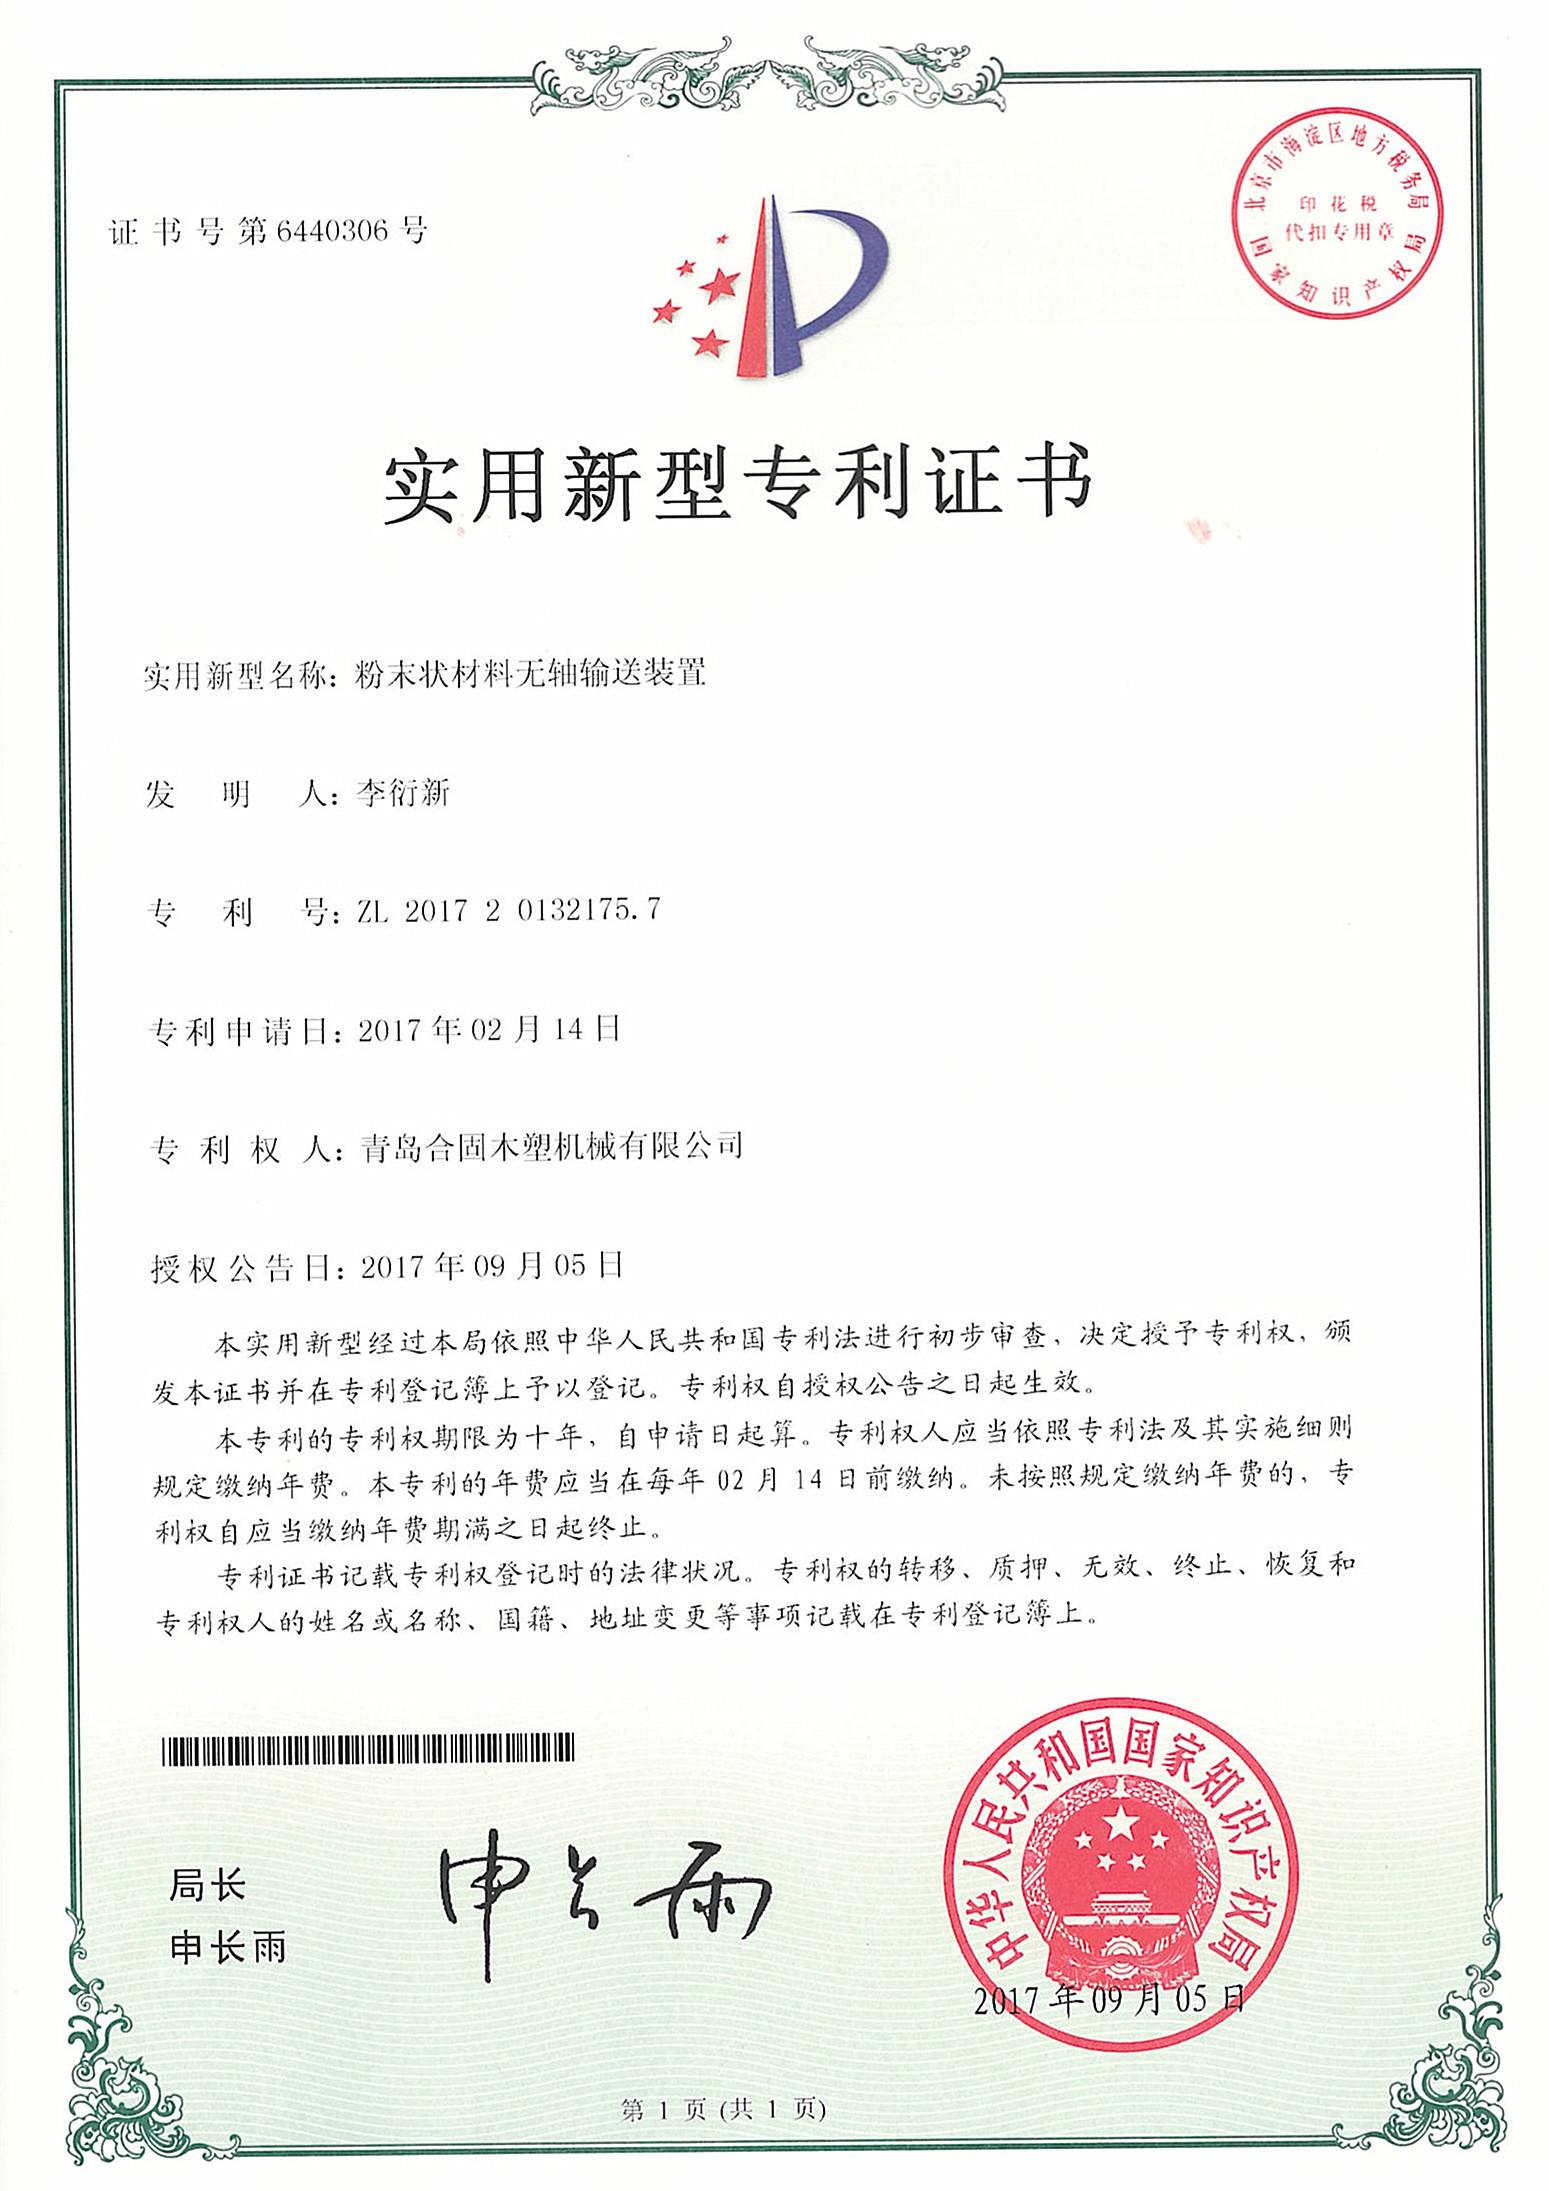 HEGU Letters Patent